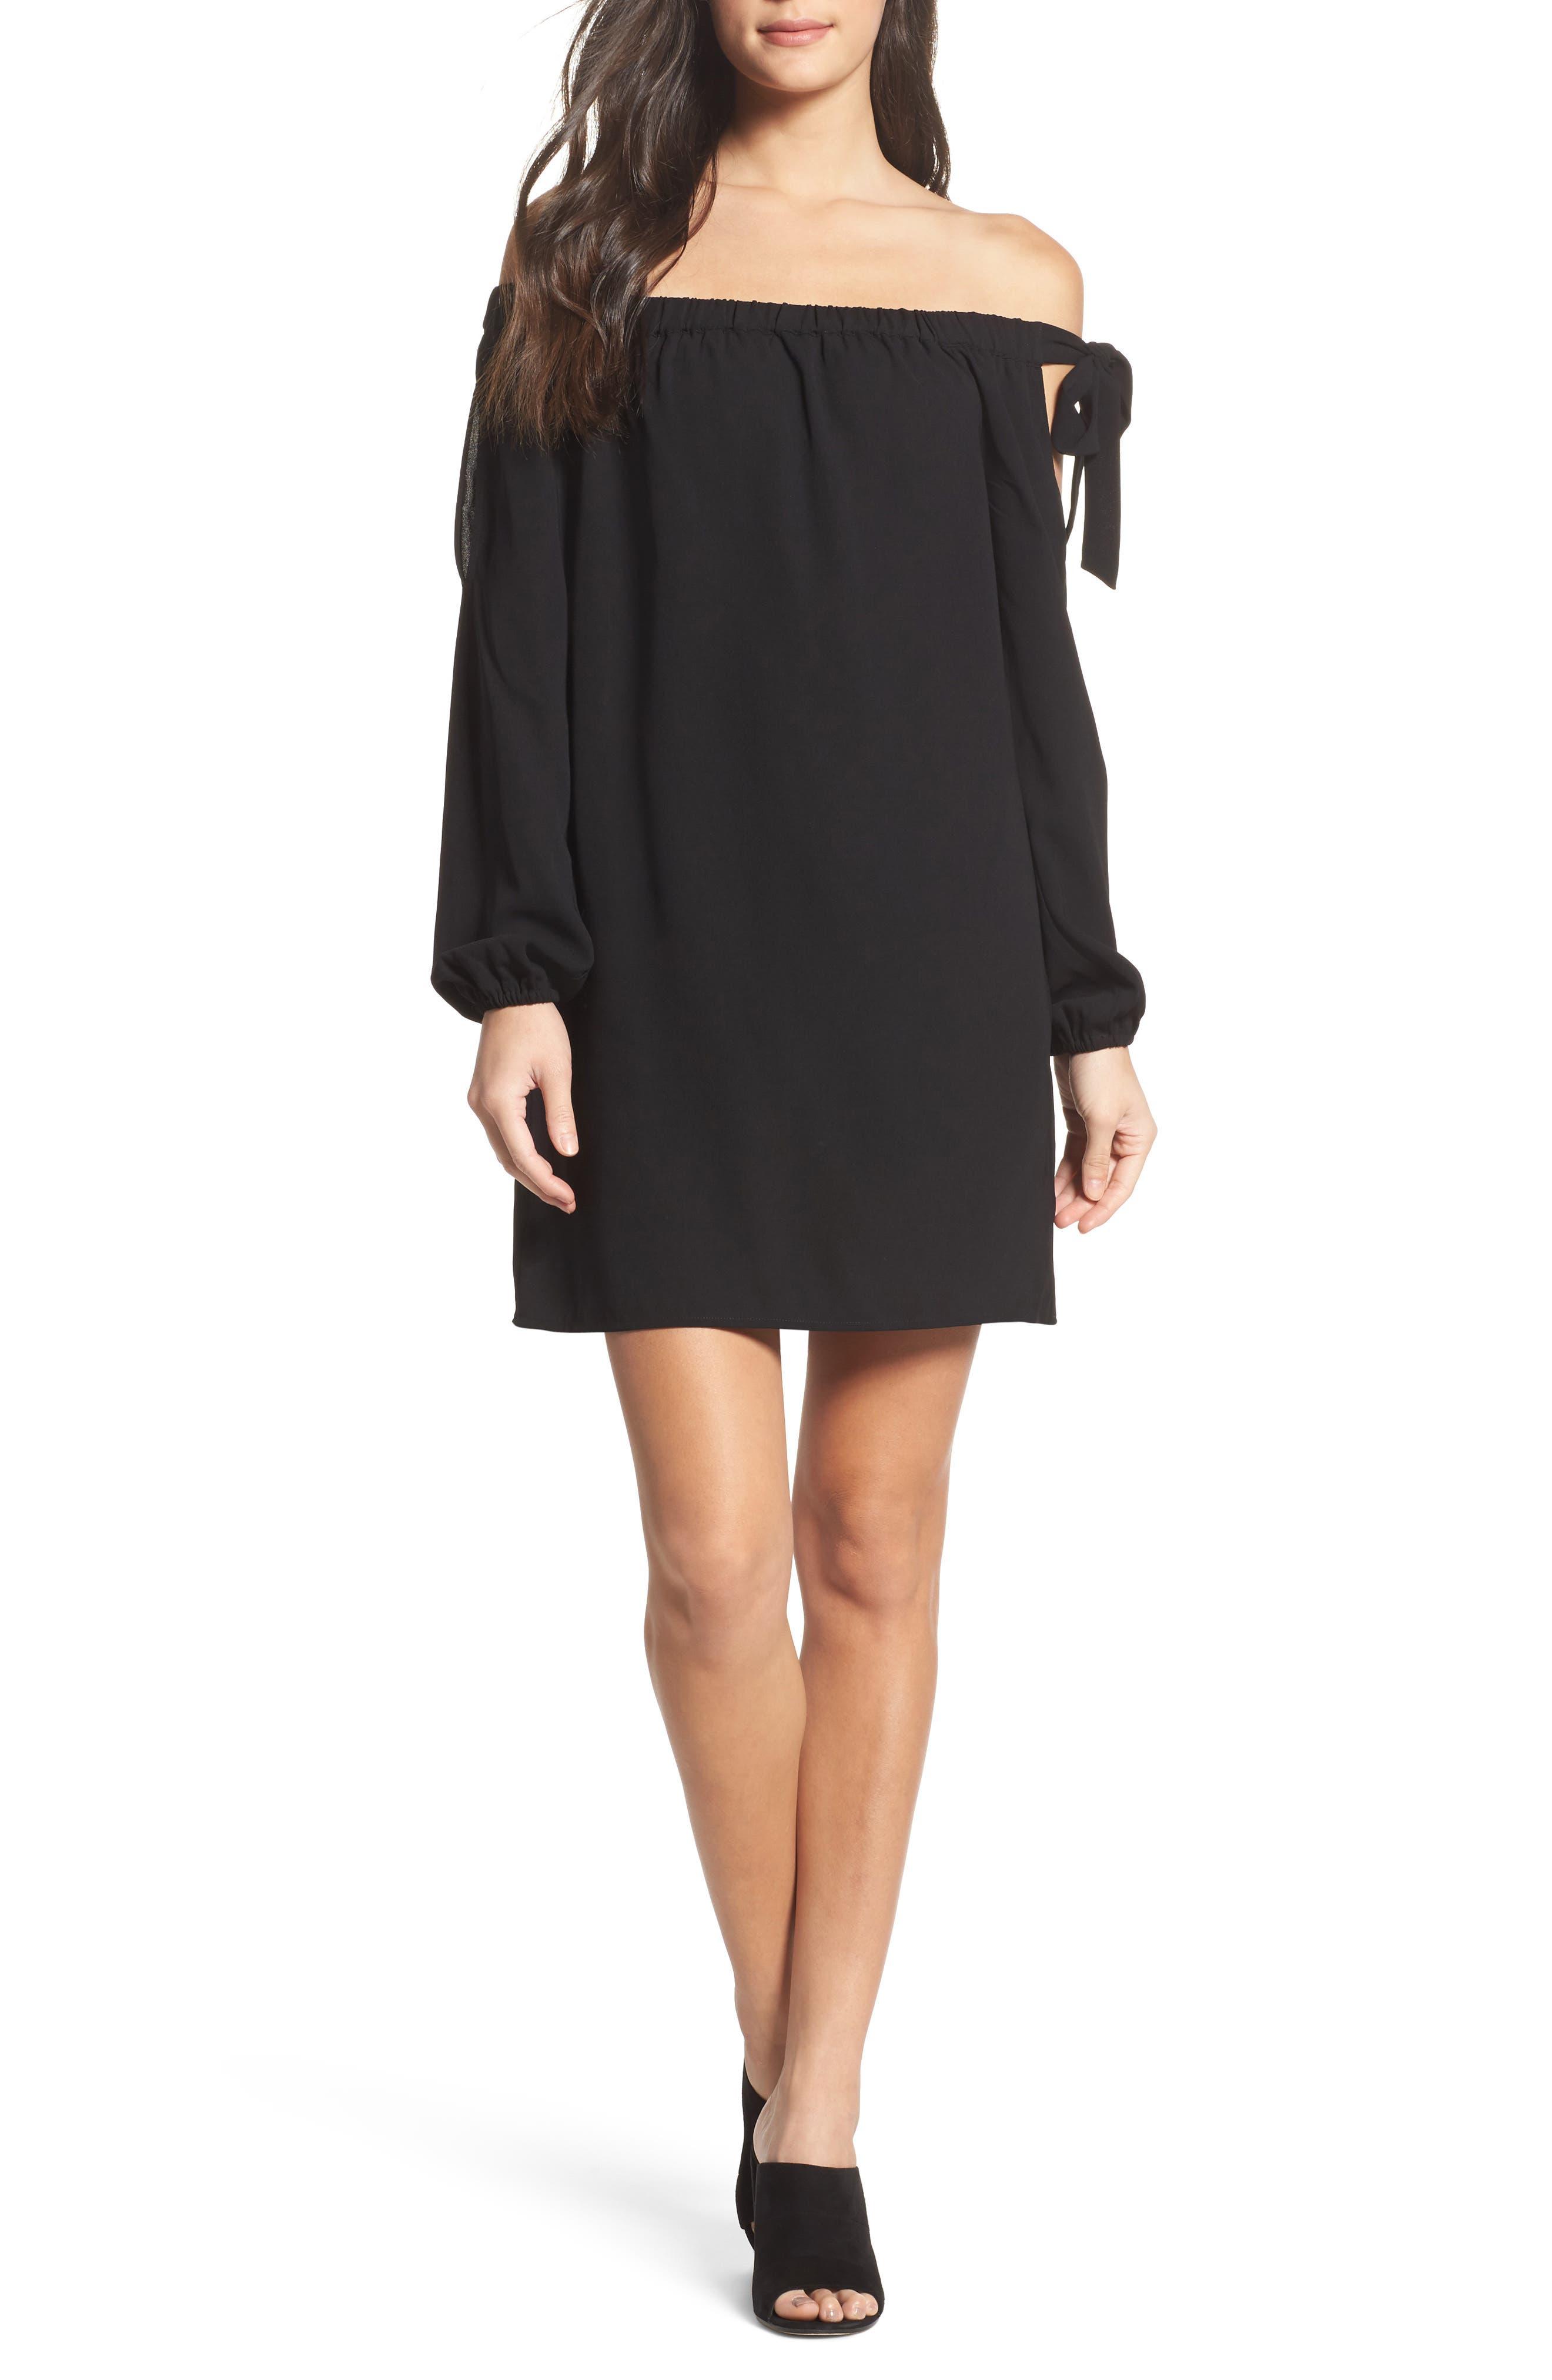 Muse Off the Shoulder Minidress,                         Main,                         color, Black